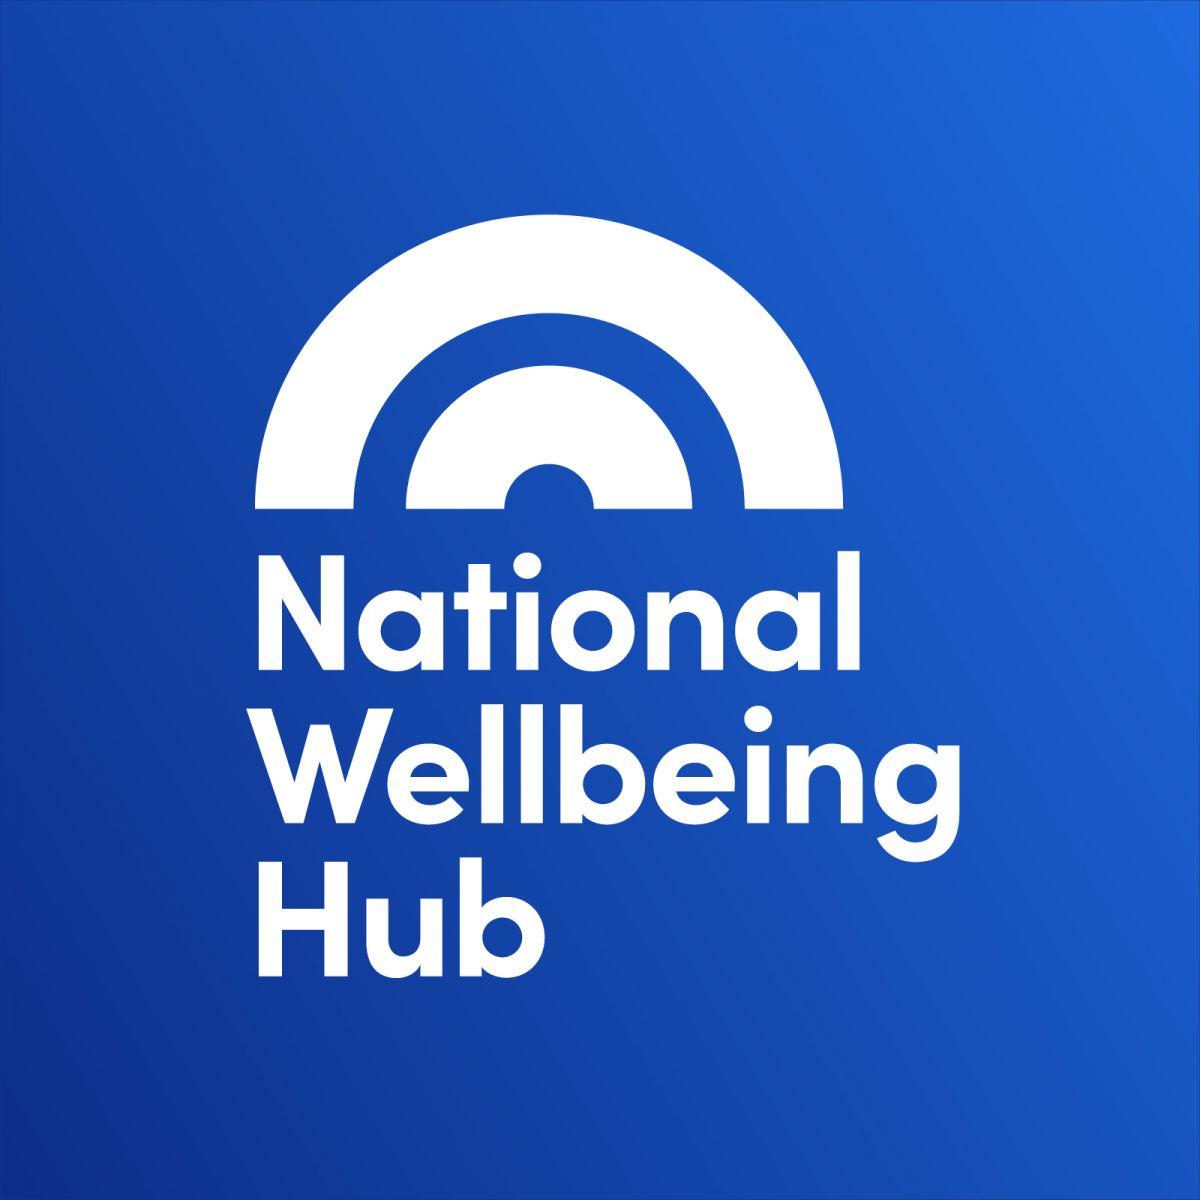 National Wellbeing Hub